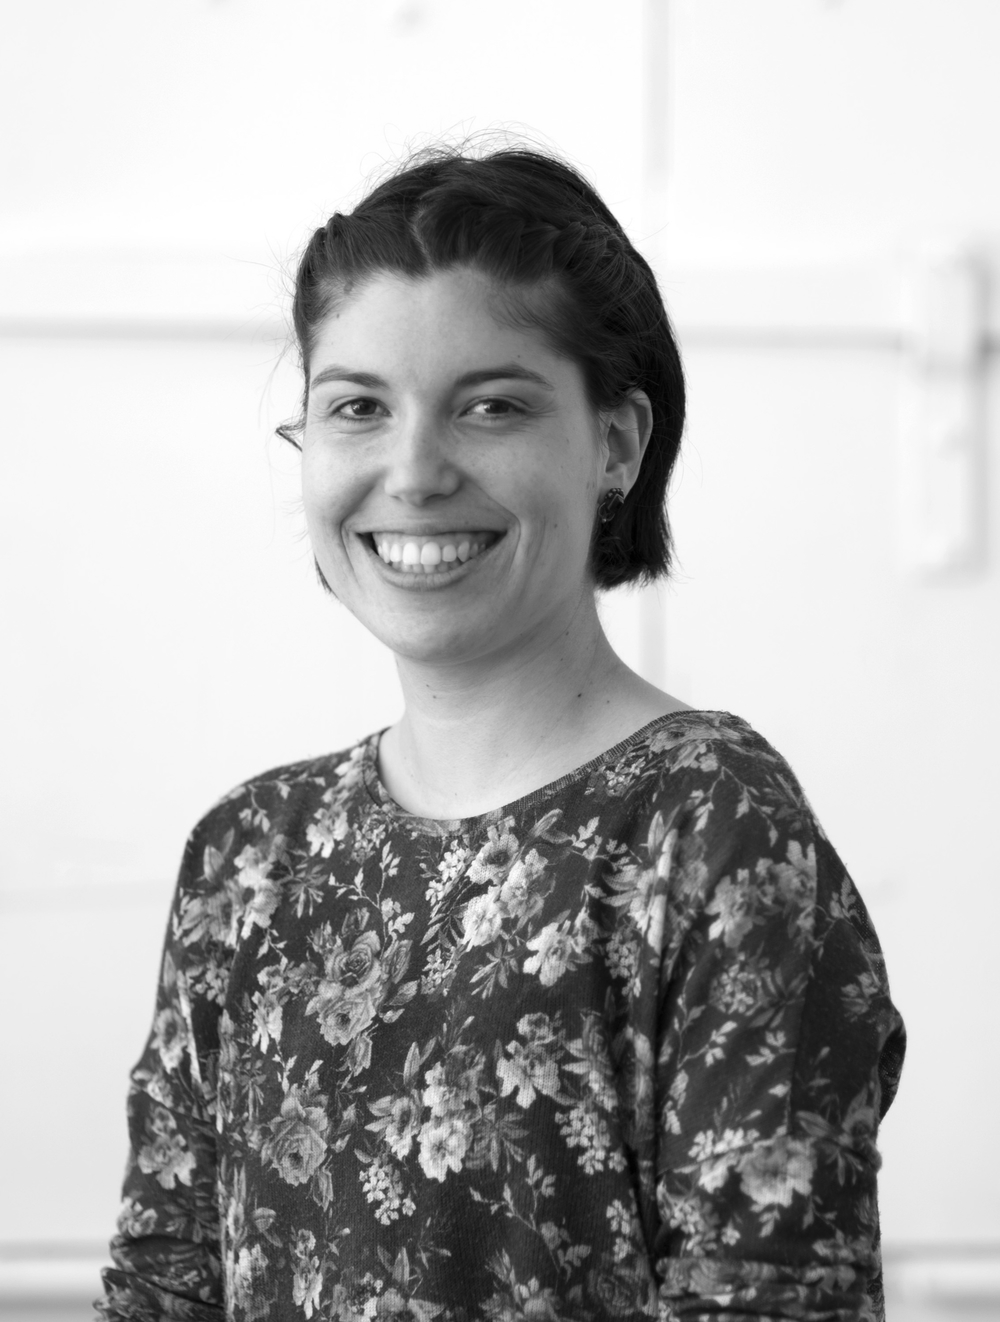 LAURA BLANCO-MORENO